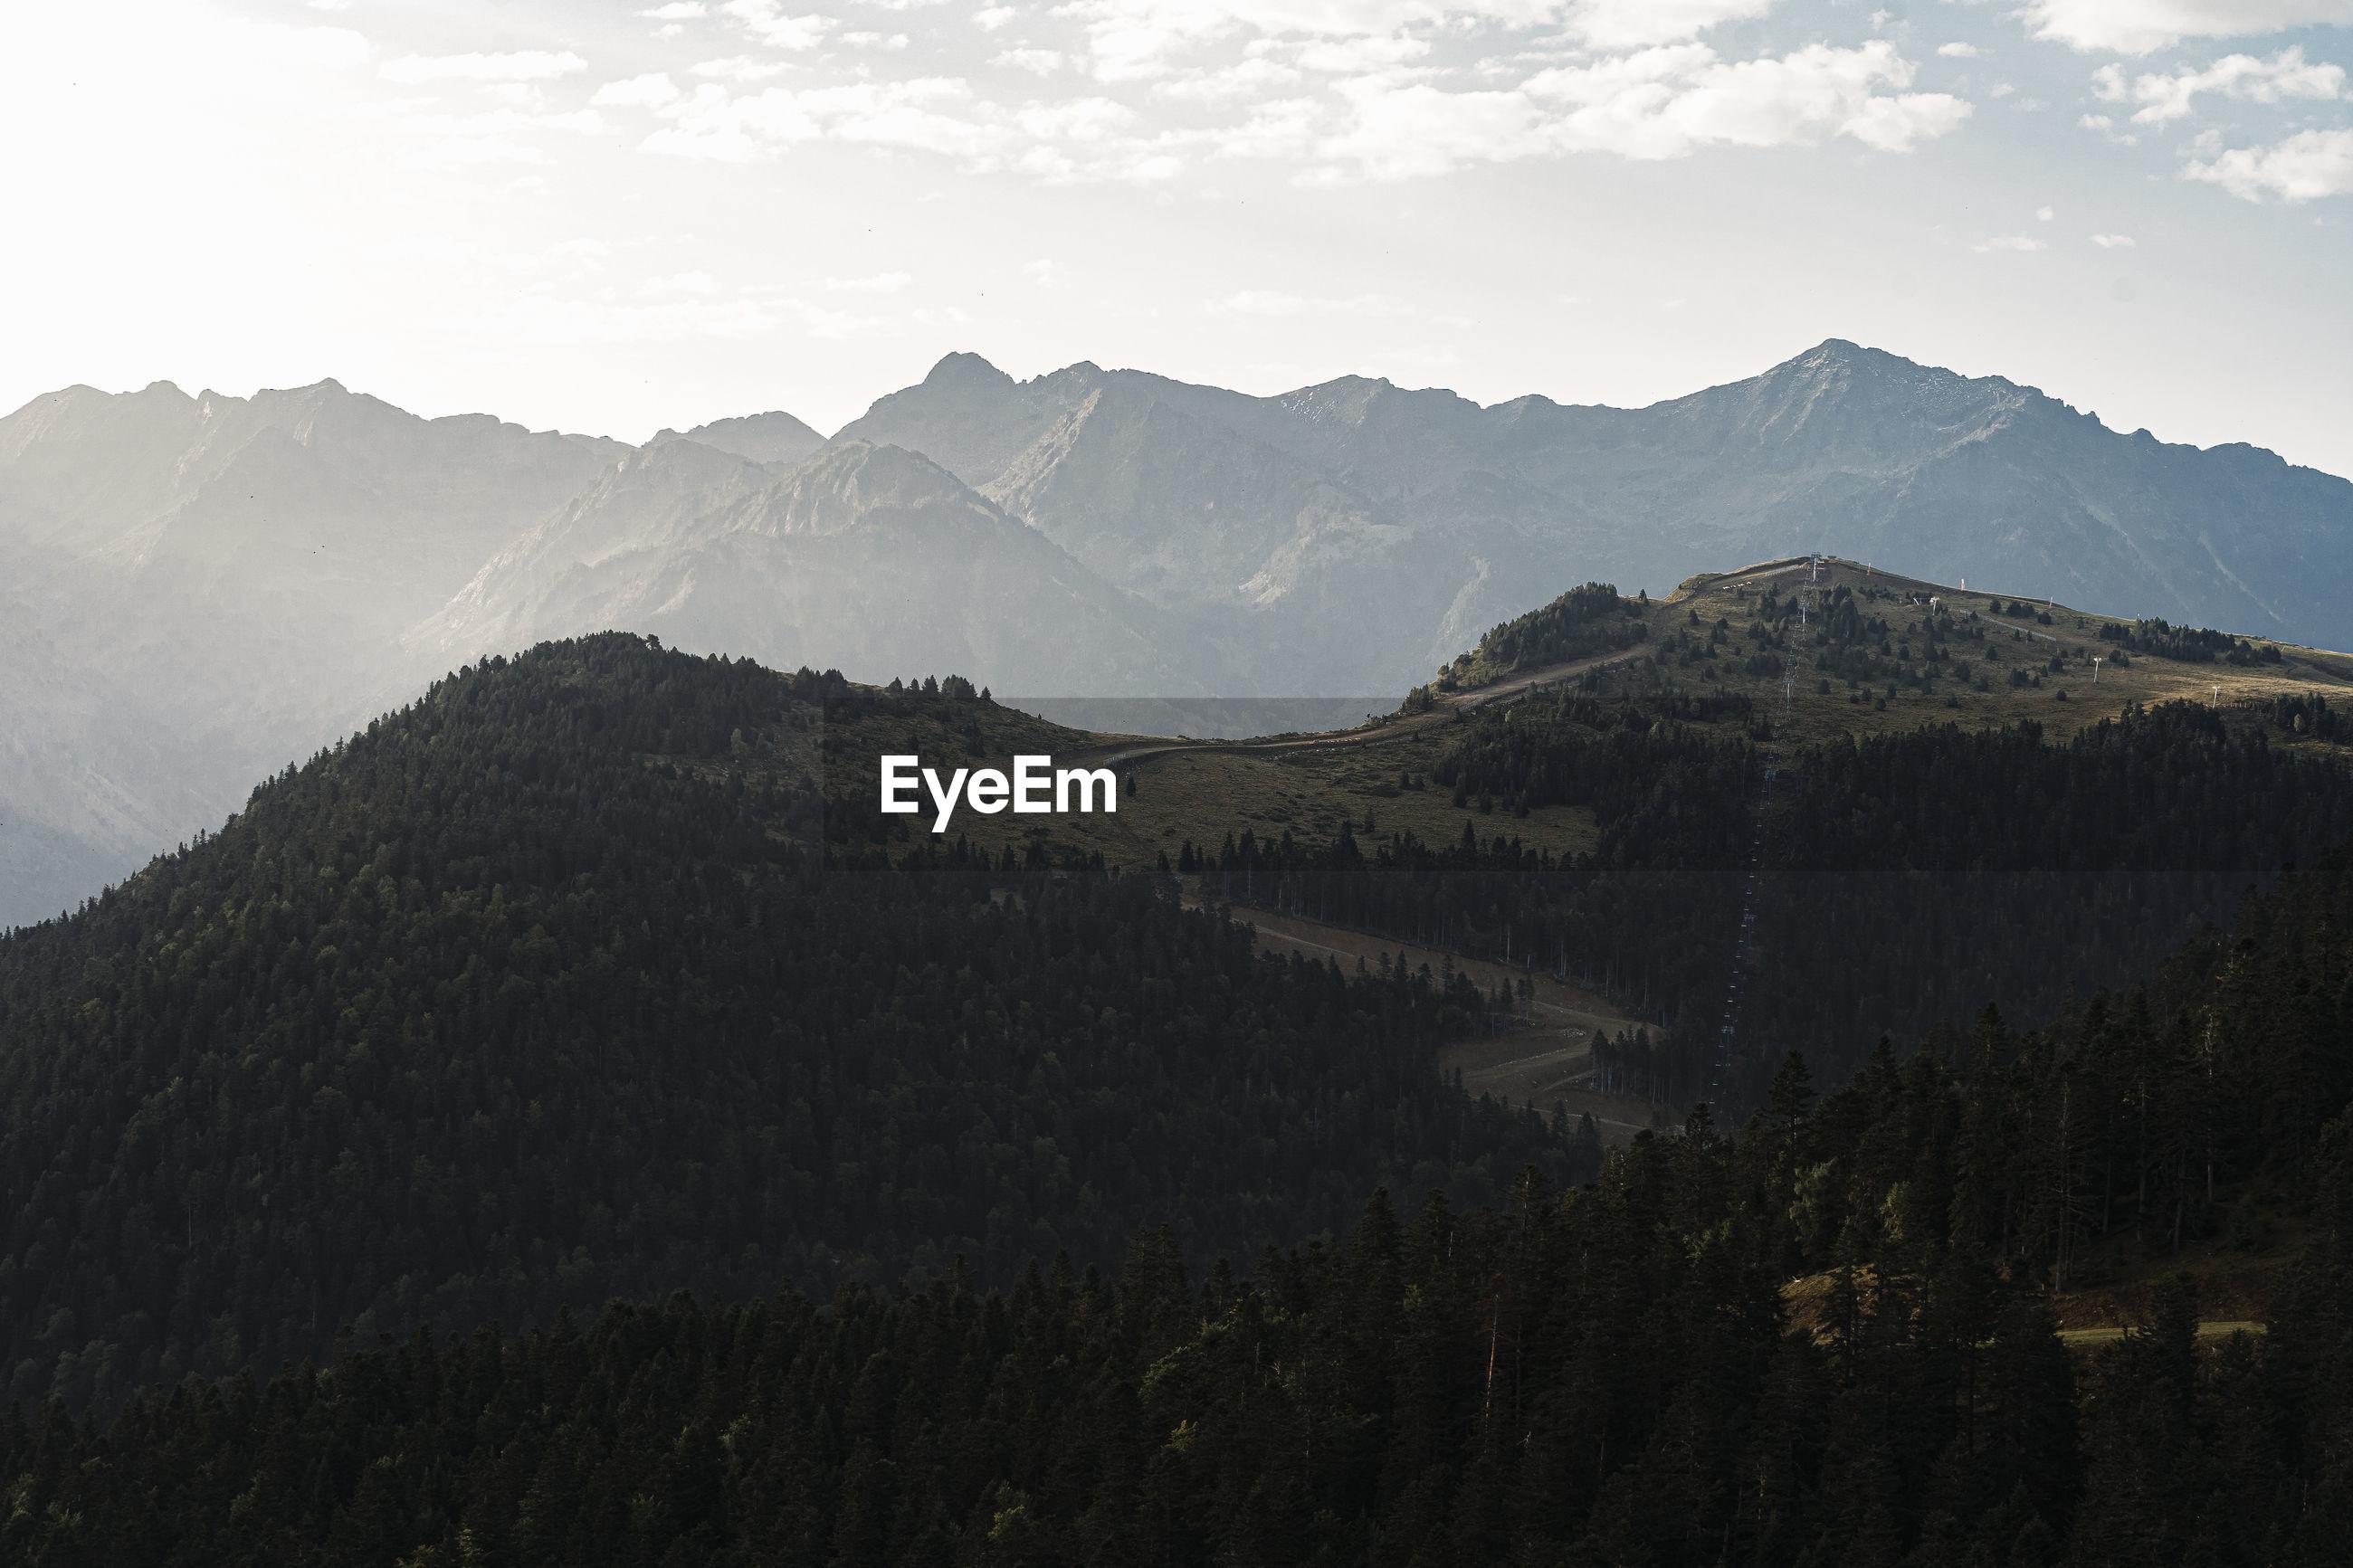 IDYLLIC SHOT OF MOUNTAINS AGAINST SKY